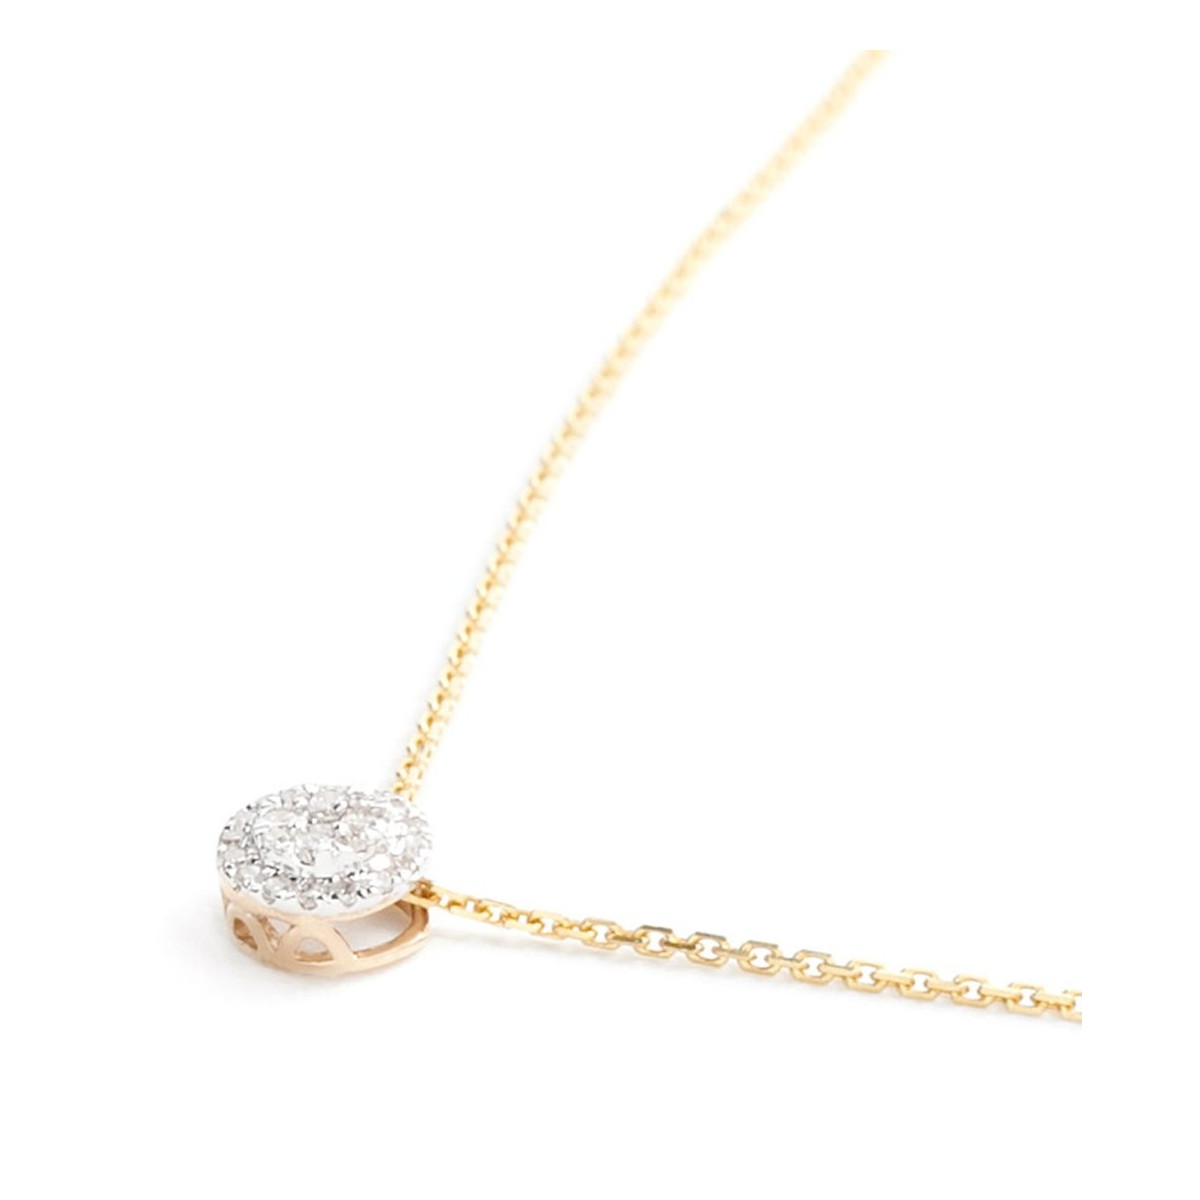 "Pendentif Or Jaune et Diamants 0,12 carat ""MON BRILLANT"" + chaîne vermeil offerte"